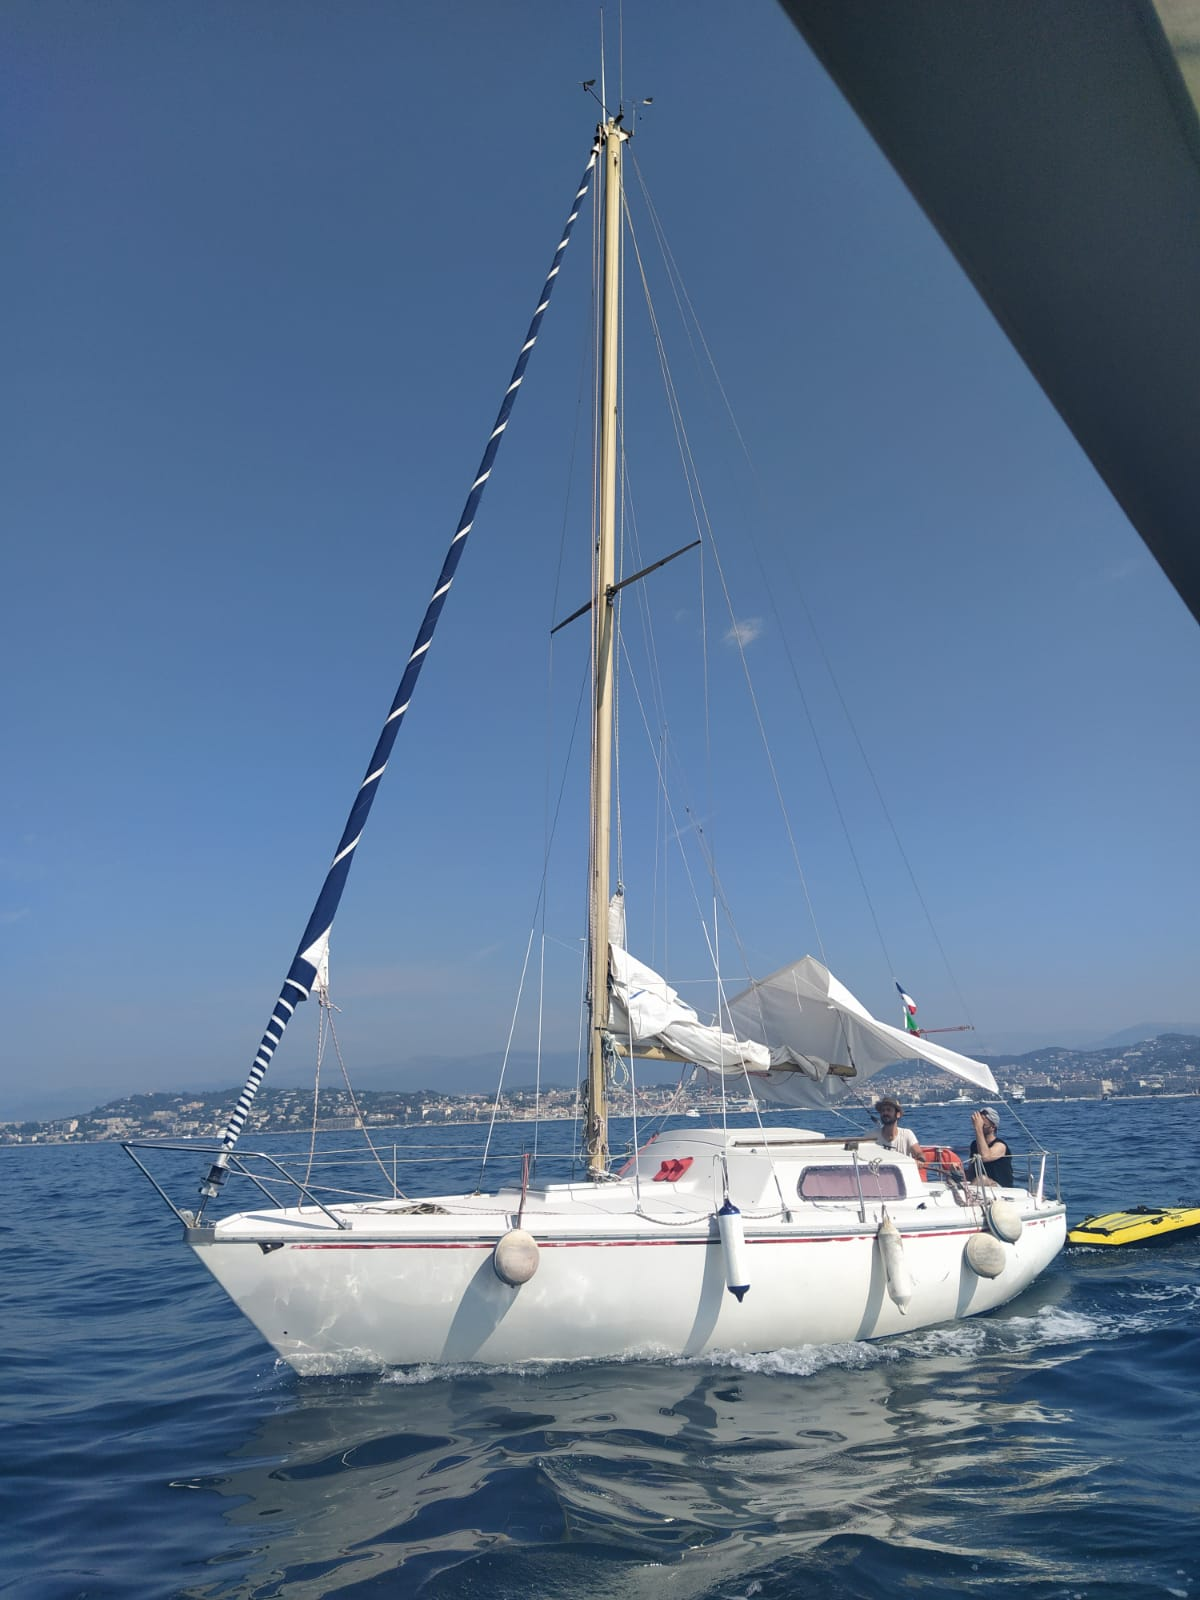 Trimous | 1 places | Port Vauban 06600 Antibes (Alpes-Maritimes)